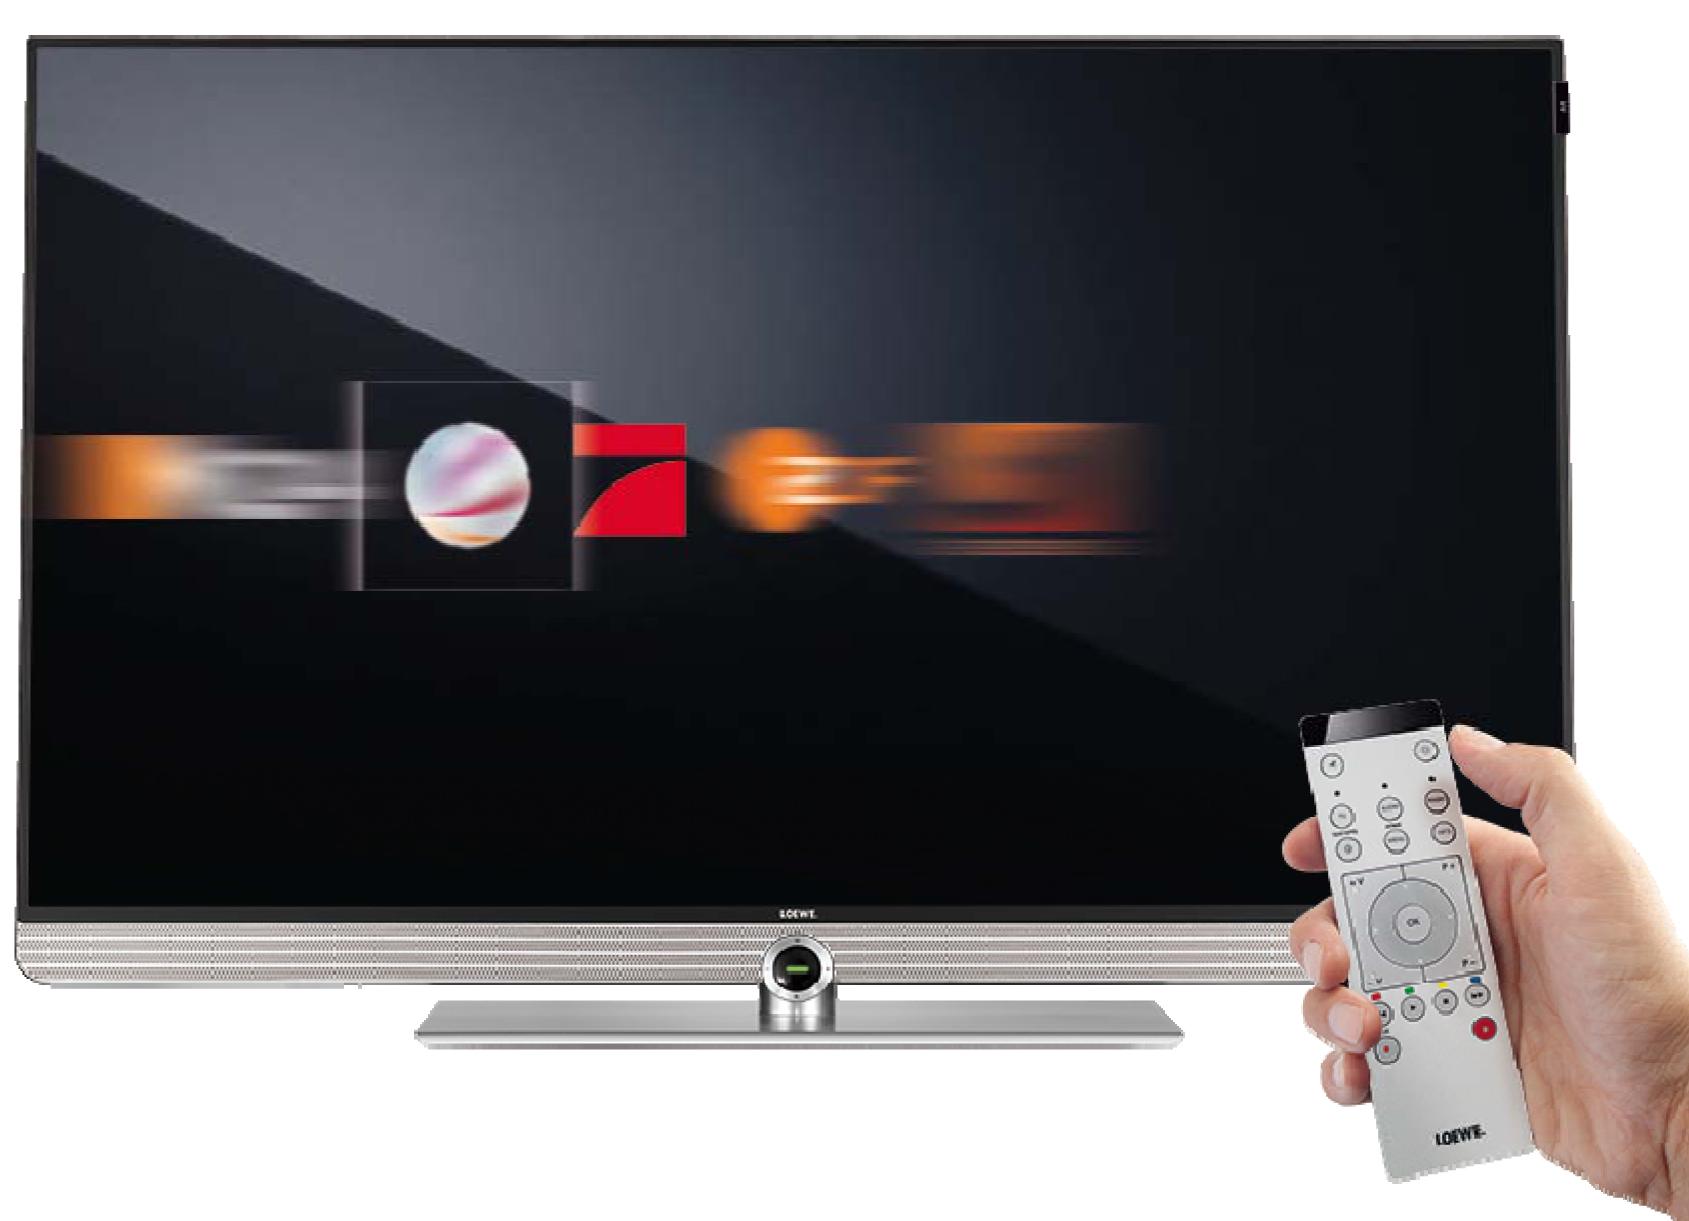 Loewe instant Channel Changement rapide des chaînes. Loewe Art 40 UHD controlsound